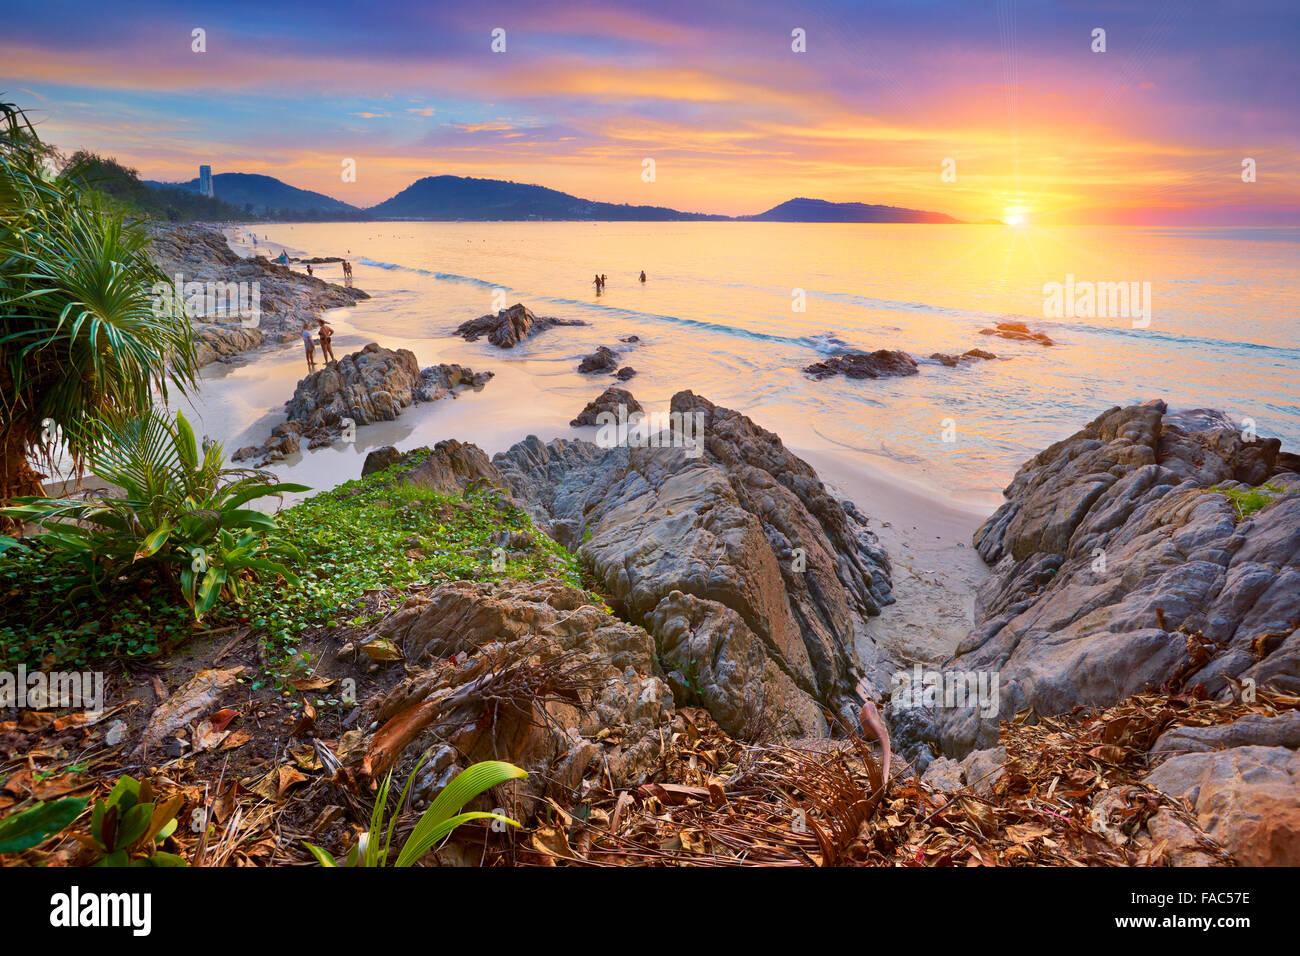 Tailandia - tropical de la isla de Phuket, Patong Beach, Sunset tiempo paisaje Imagen De Stock